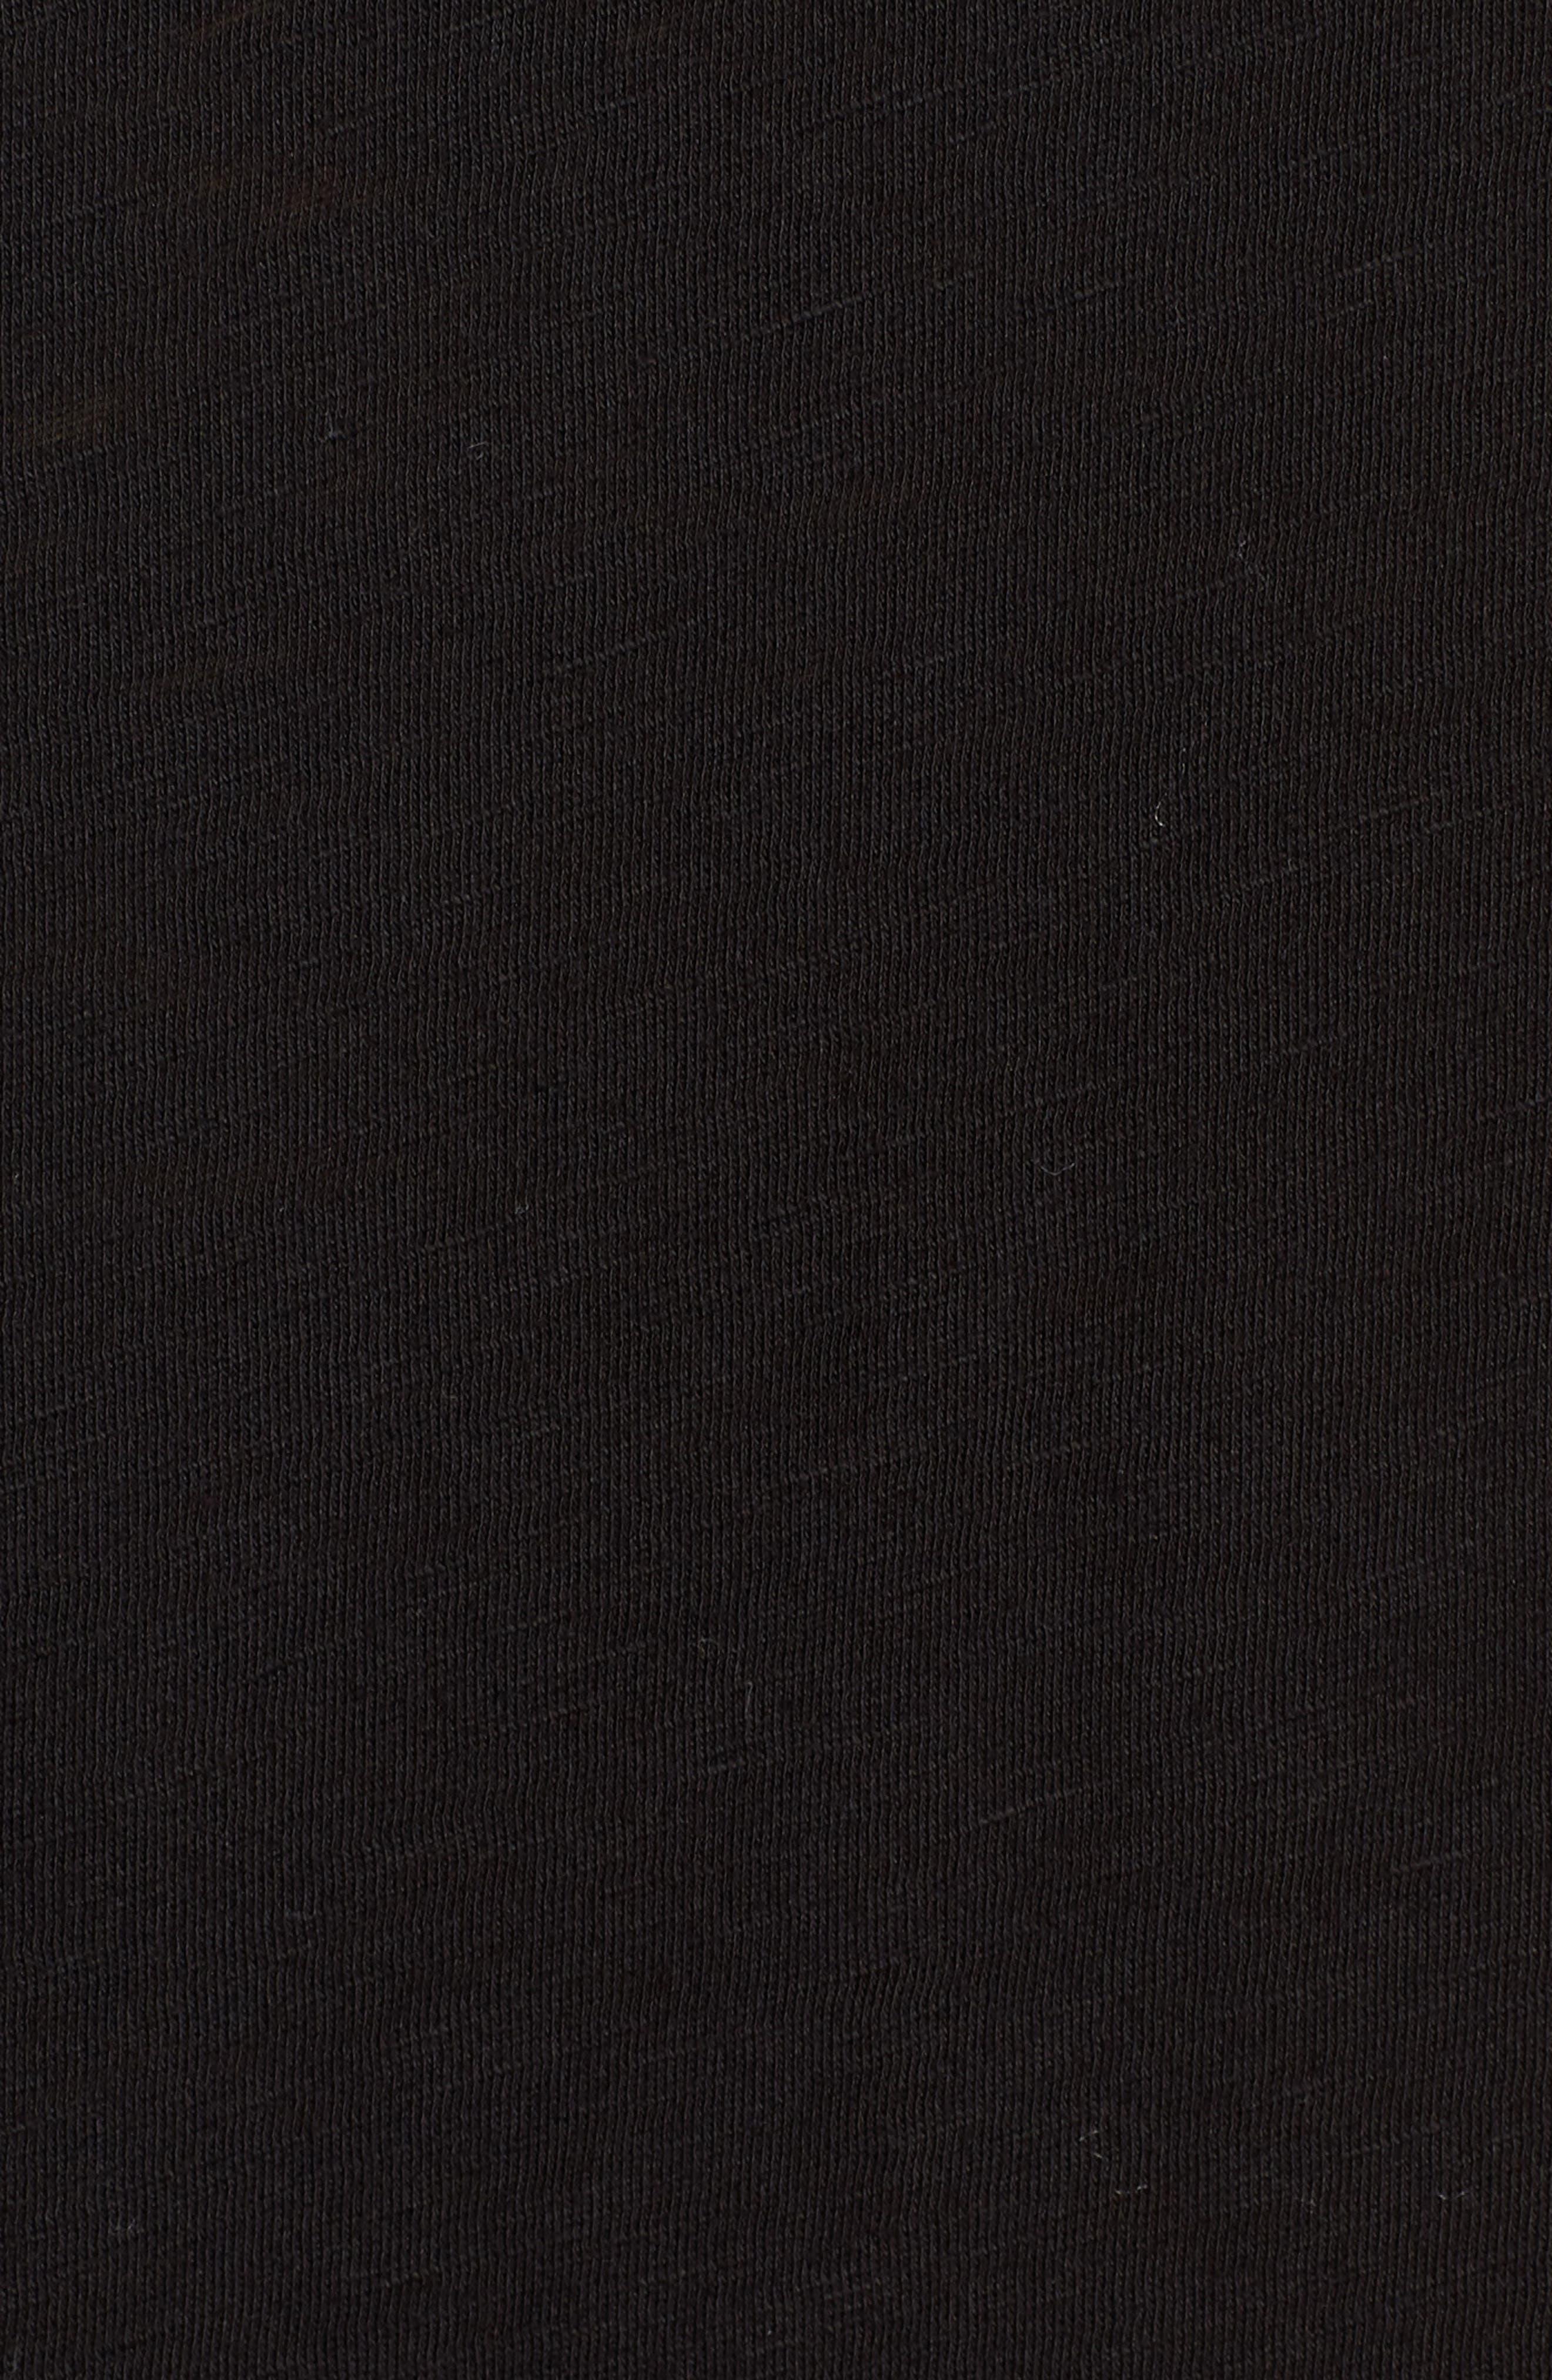 Twist Hem Slub Supima<sup>®</sup> Cotton Tank,                             Alternate thumbnail 6, color,                             BLACK